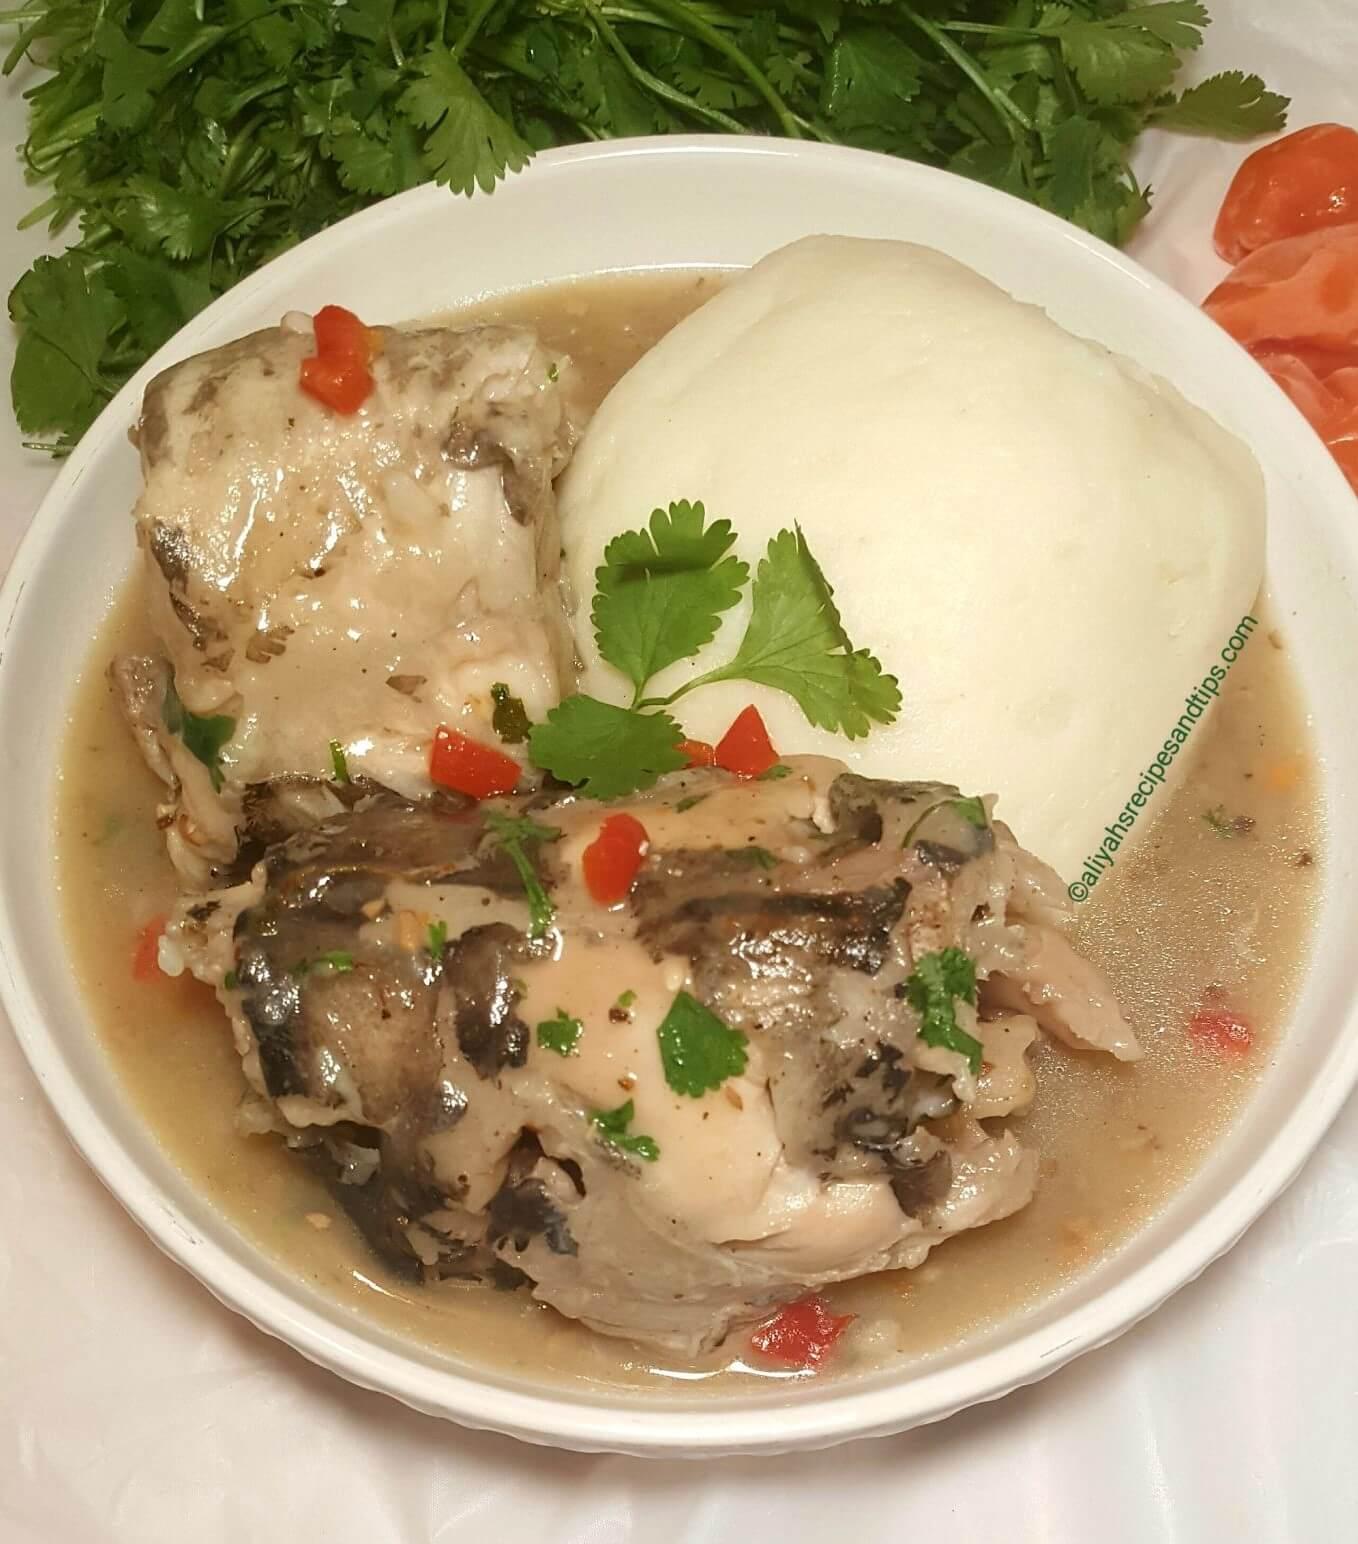 ofe nsala, white soup, ofe nsala white soup, ehuru, calabash nutmeg,Igbo Nigerian,swallow, pepper soup, chicken, food, uziza, fish, stockfish, yam, fufu, African white soup, Nigerian ofe nsala, Nigerian white soup, Igbo ofe nsala, eastern soup, African soup